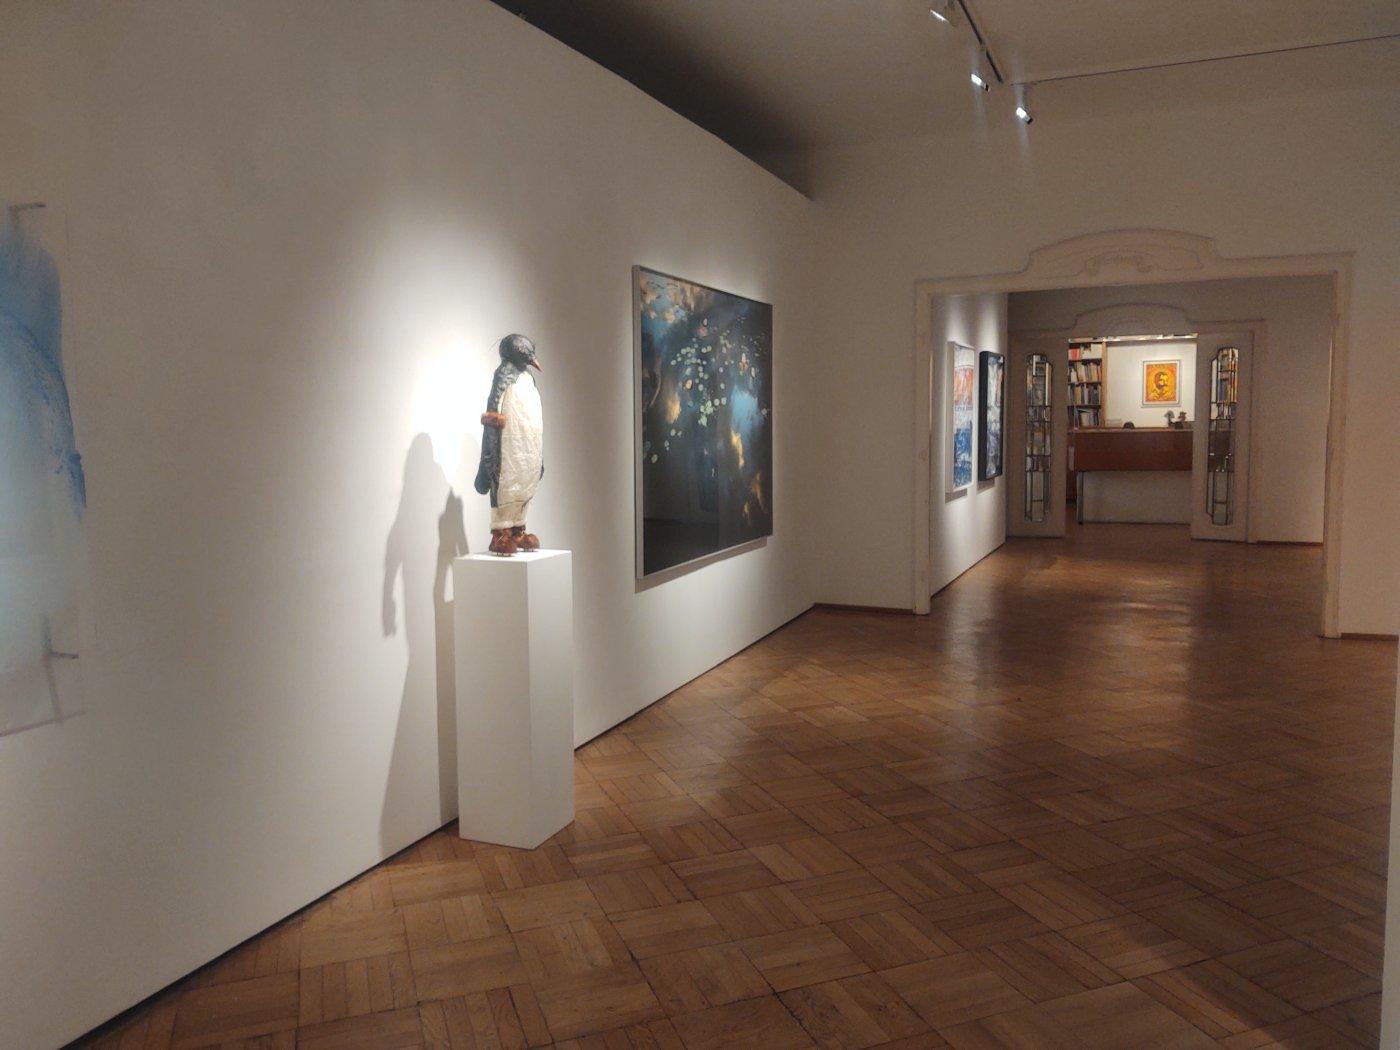 Galerie Ernst Hilger Terra Australis 5